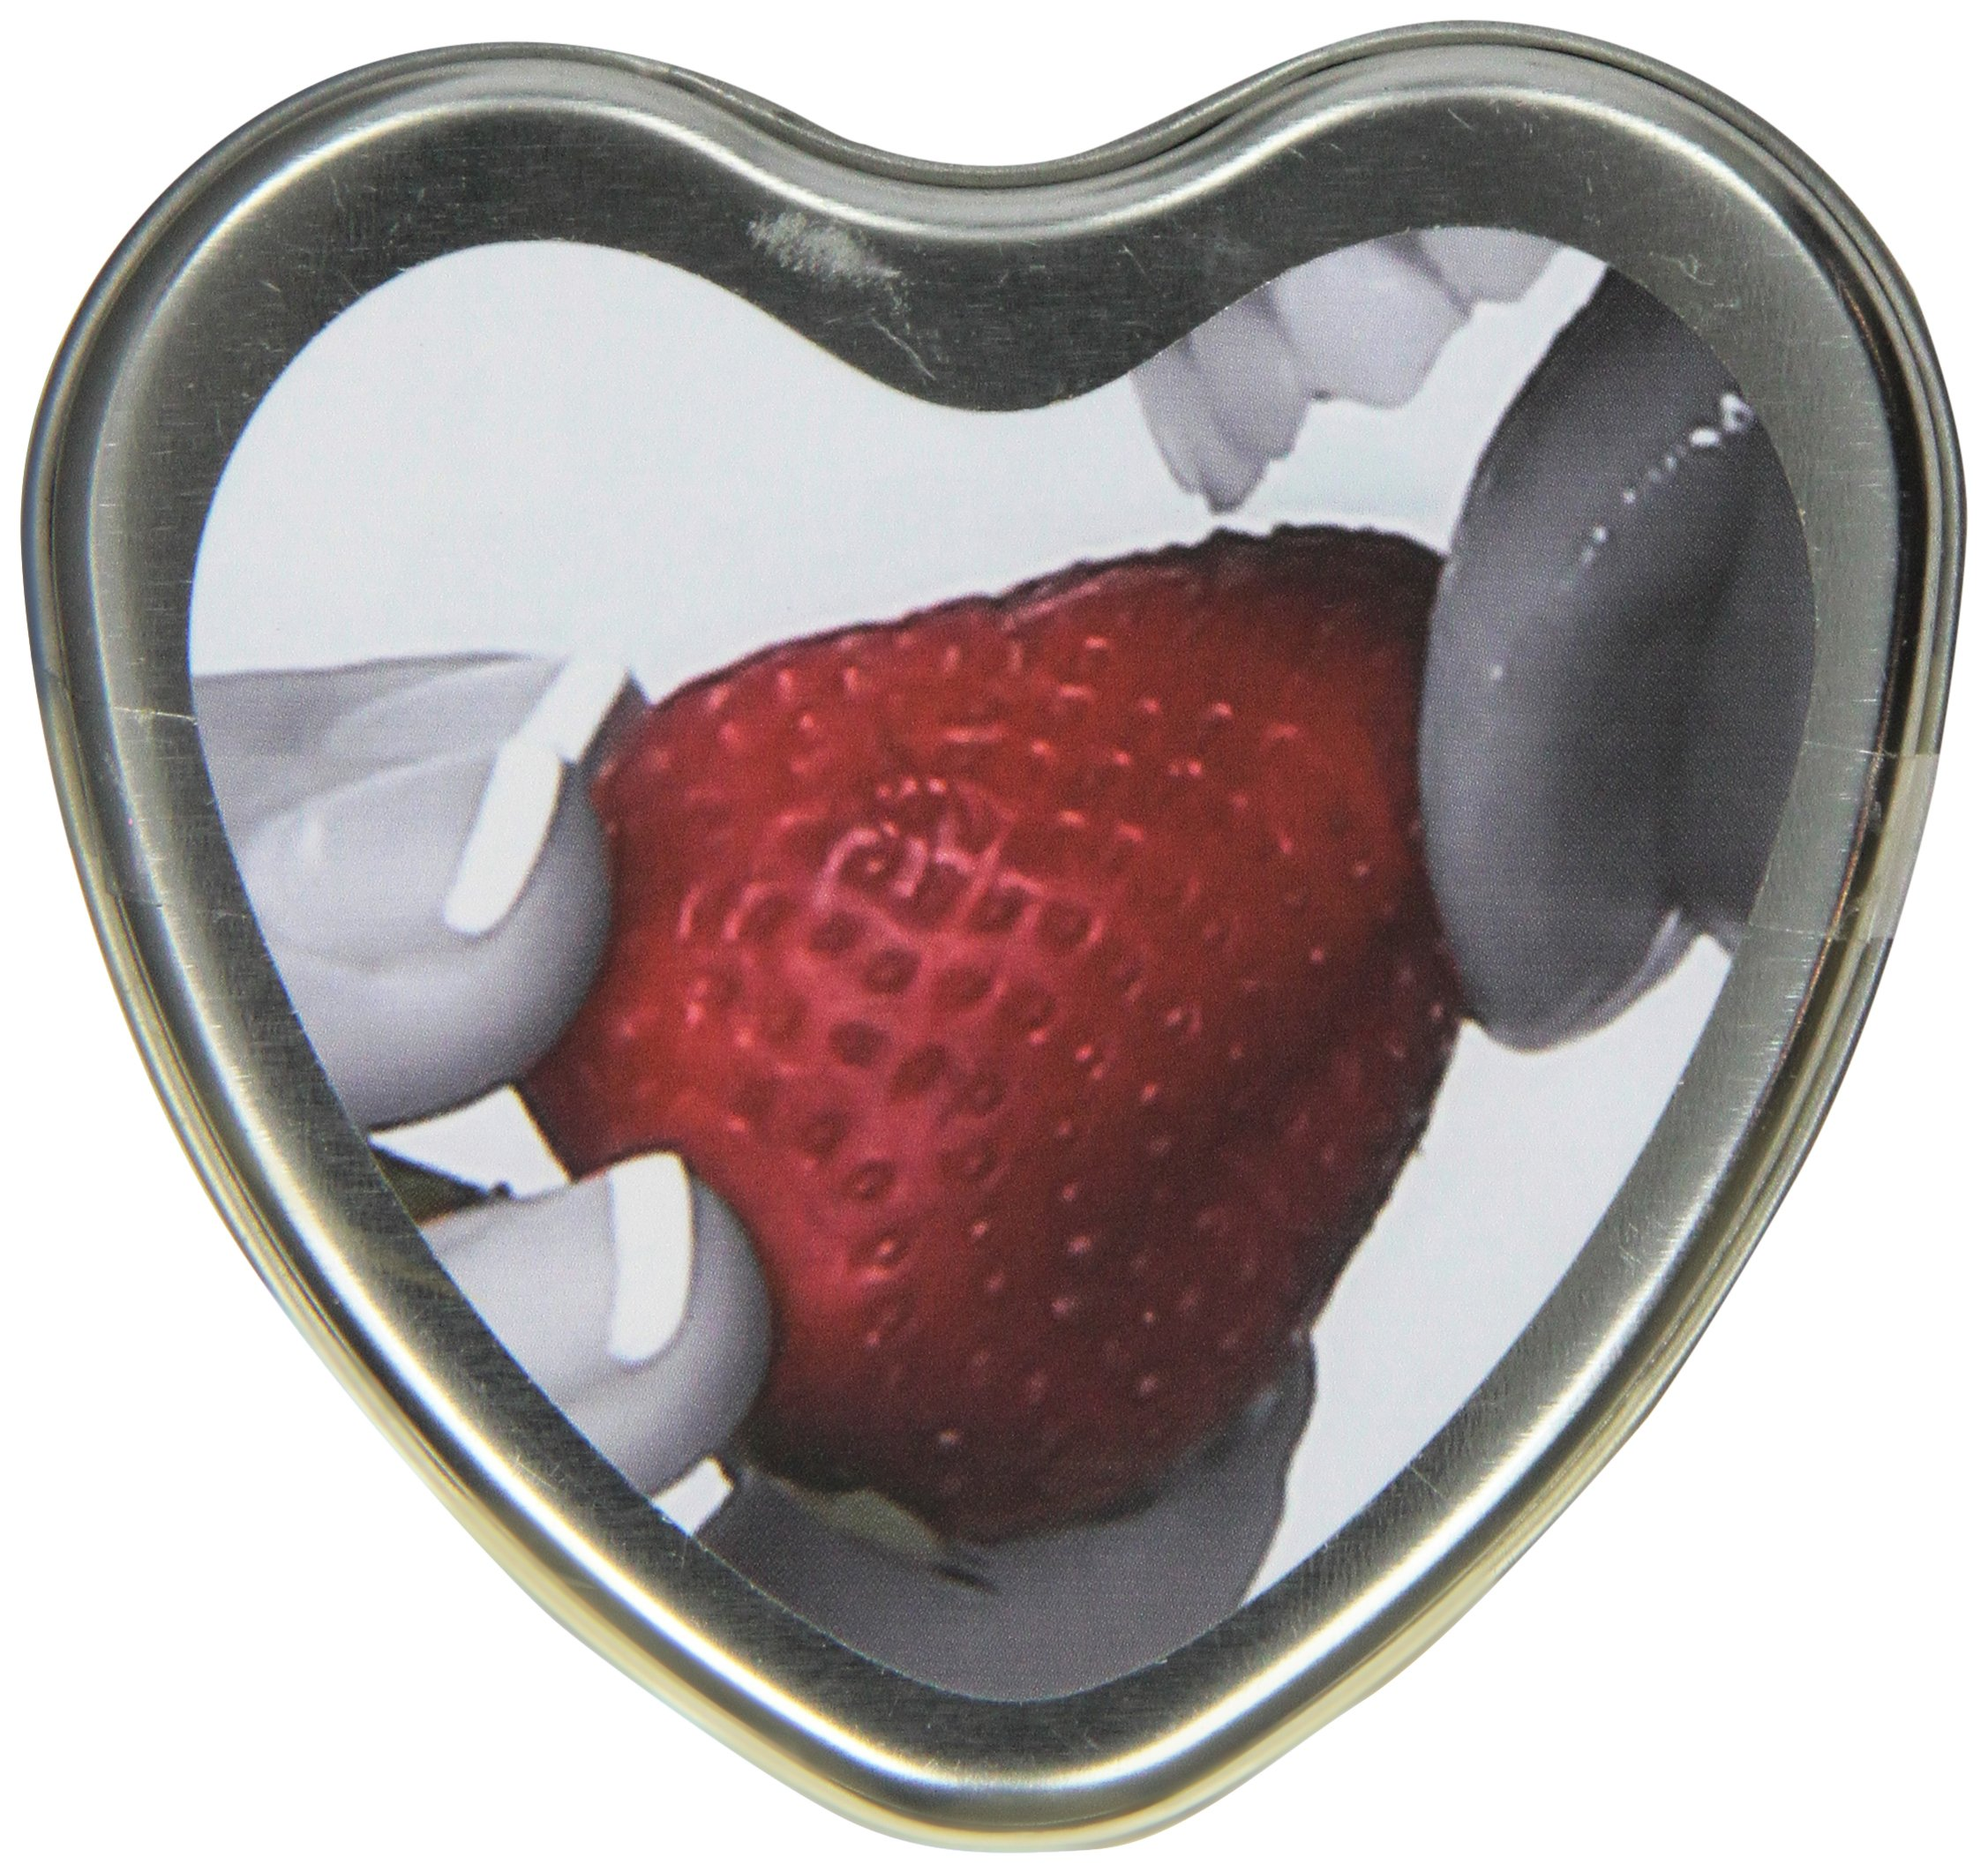 Earthly Body Edible Heart Candle, Strawberry, 4 ounces Tin